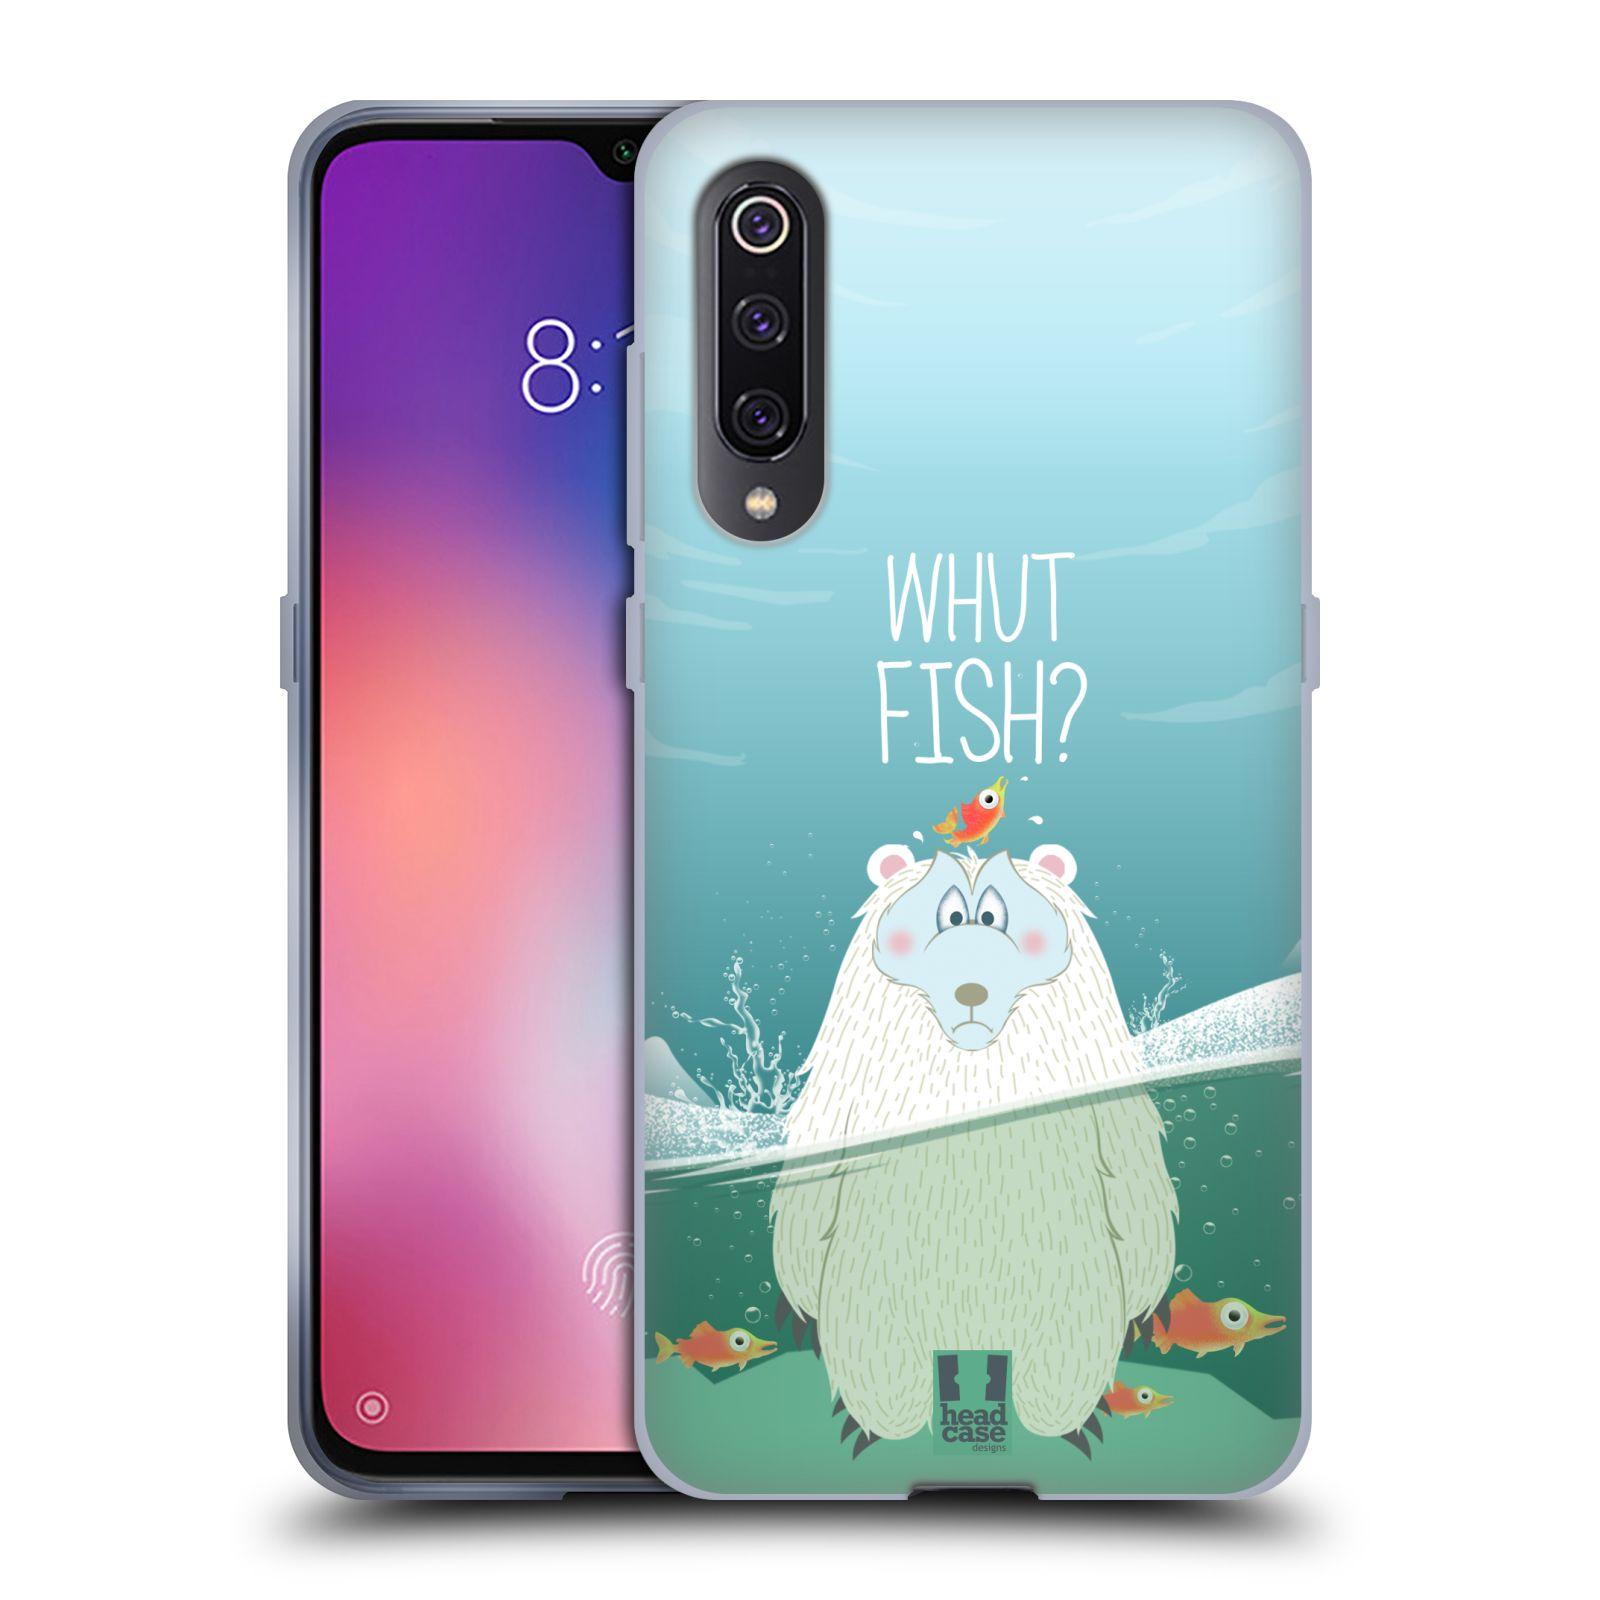 Silikonové pouzdro na mobil Xiaomi Mi 9 - Head Case - Medvěd Whut Fish?